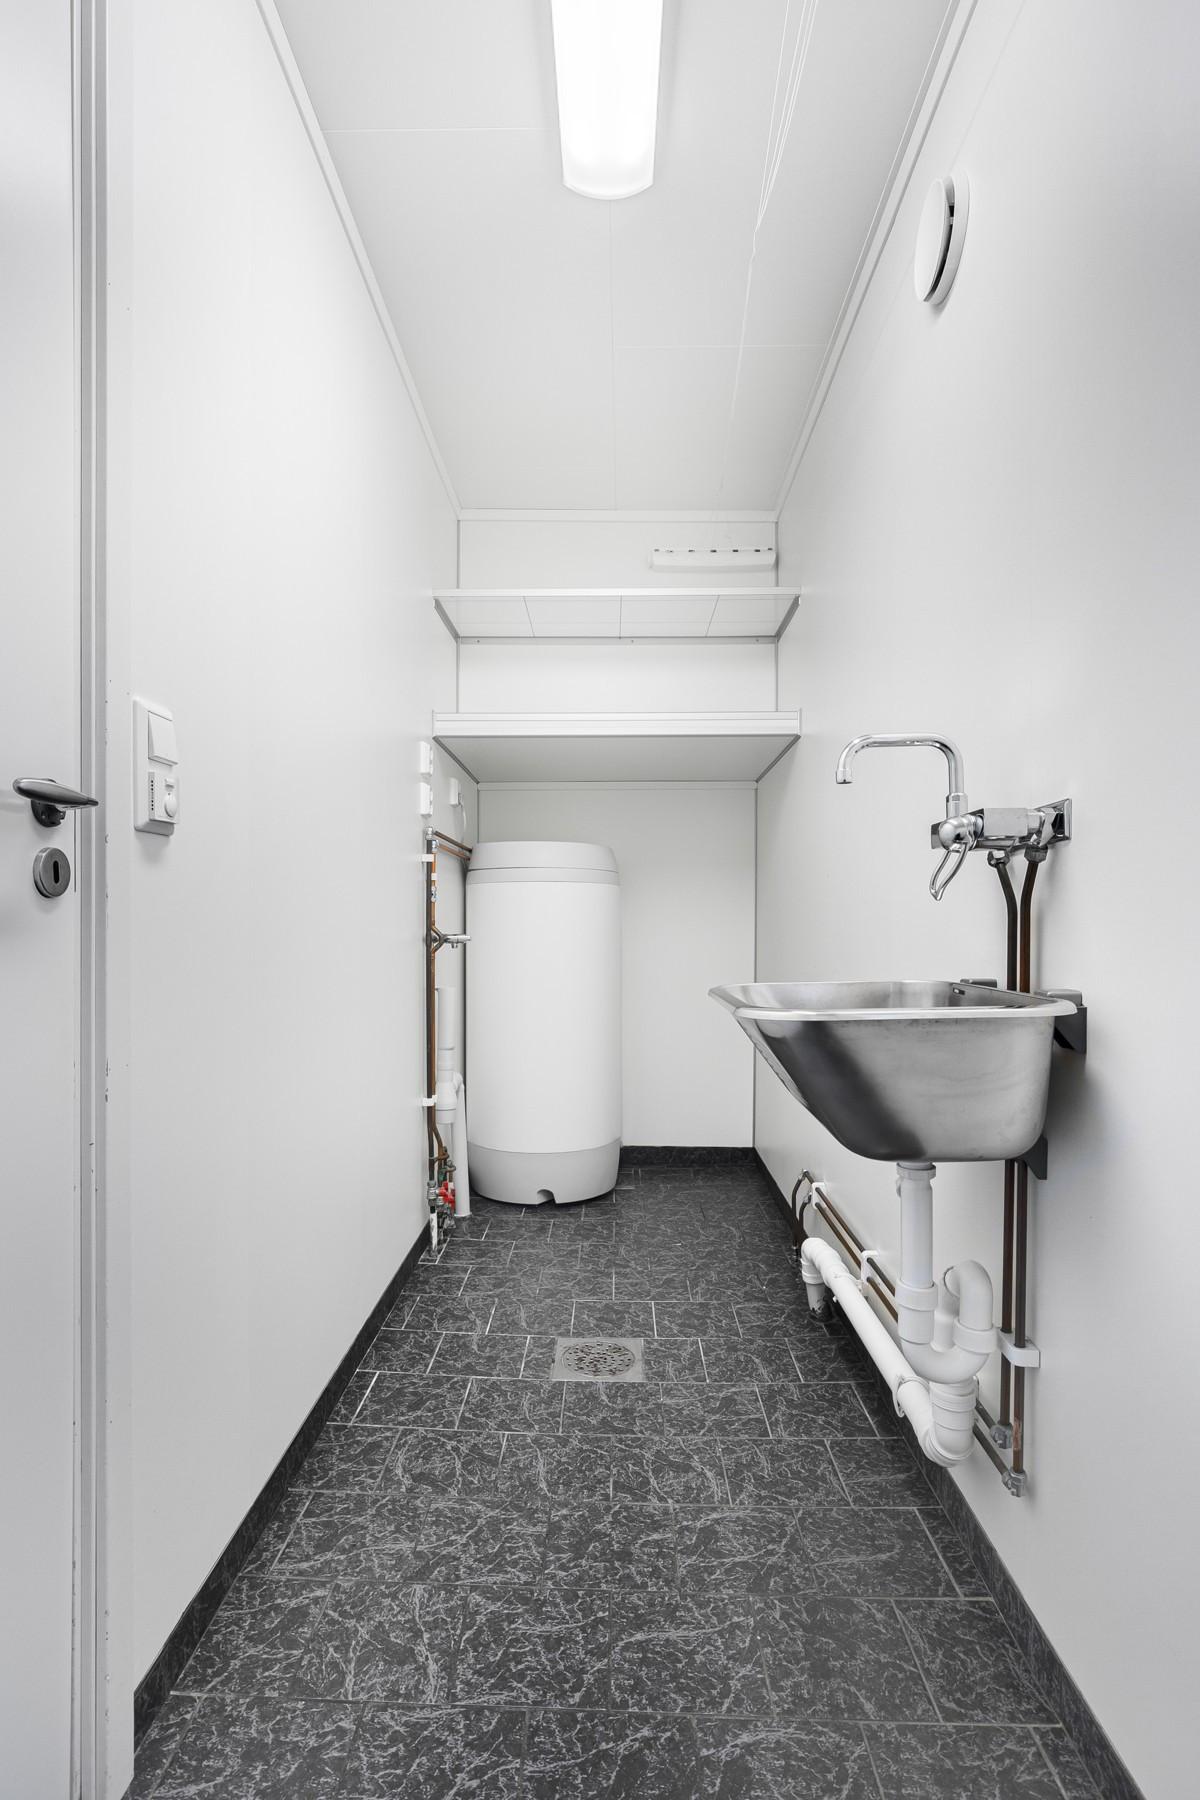 Flislagt vaskerom med gulvvarme